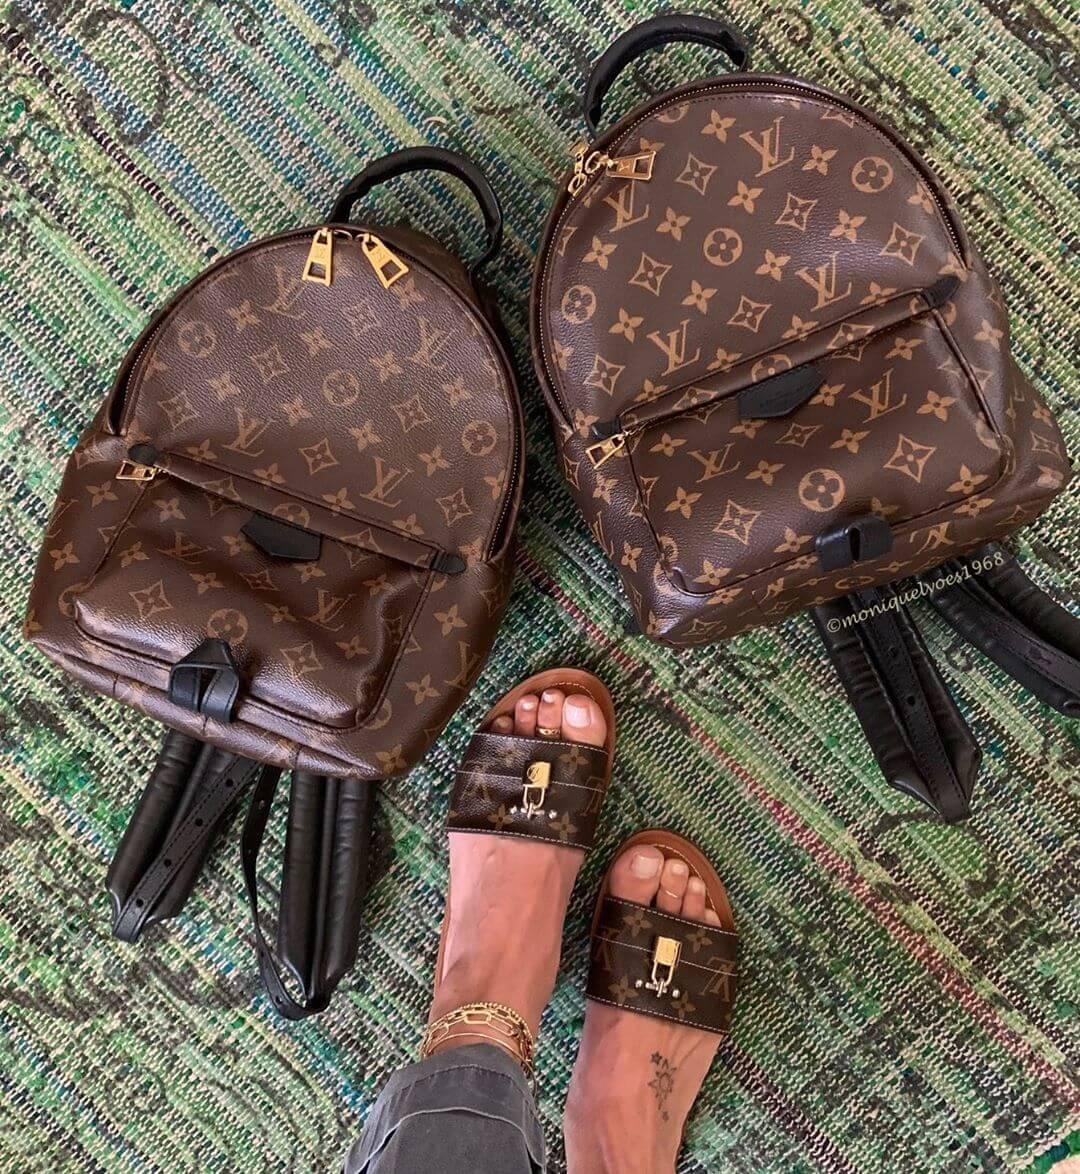 Backpacks Bags - Travel Backpack Bags & College